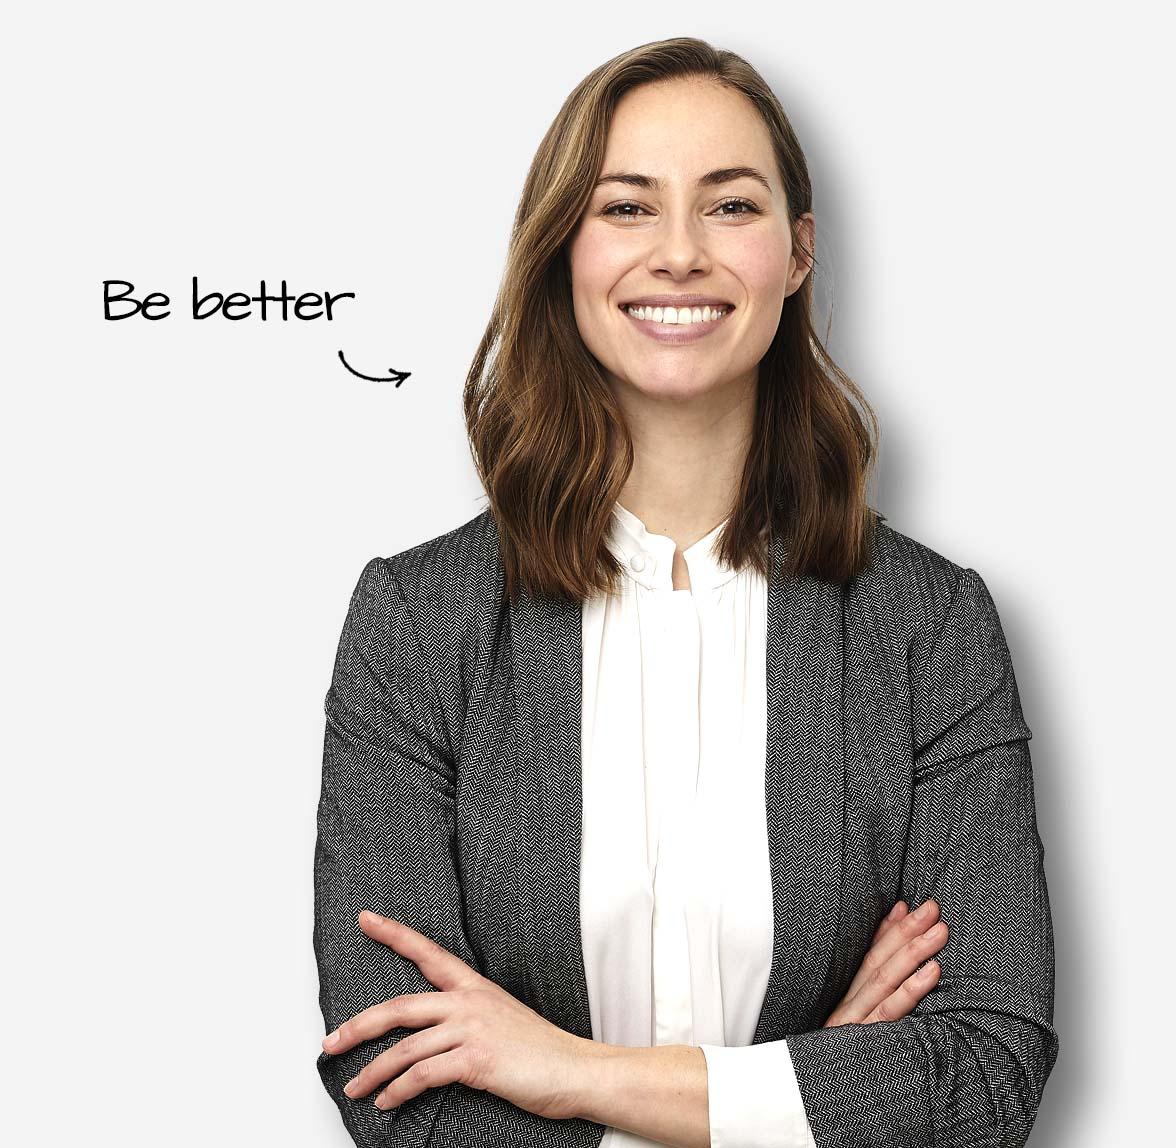 Digitale Wettbewerbsanalyse - Be Better